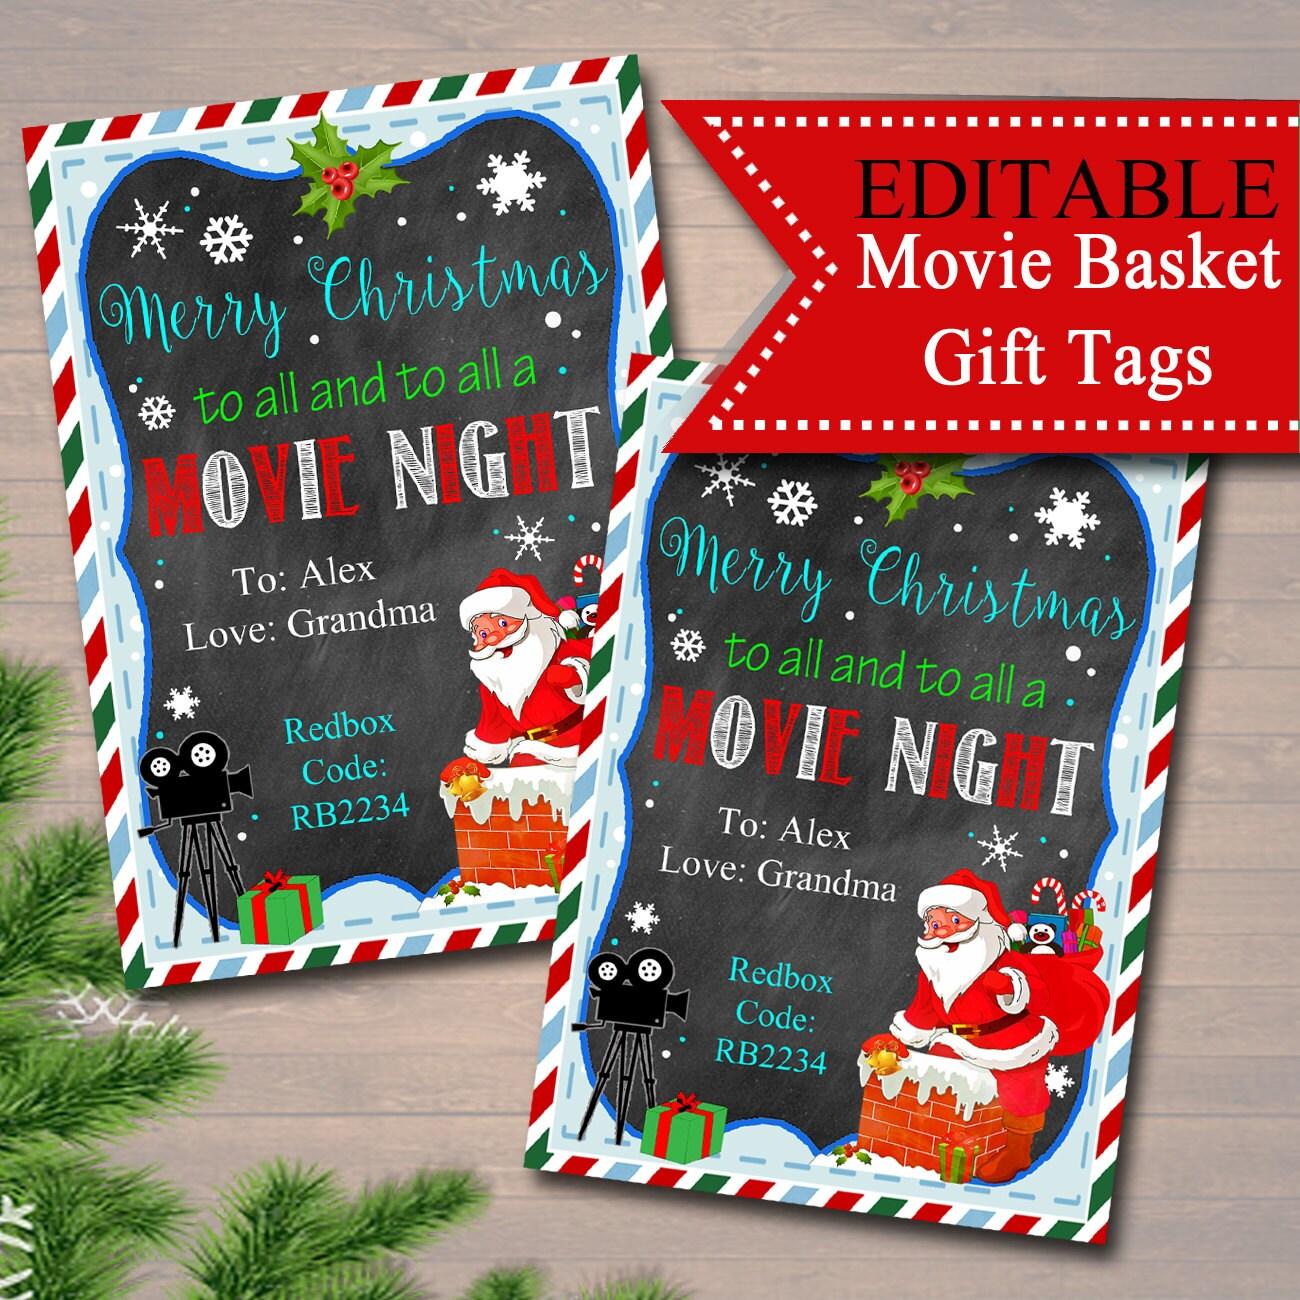 Christmas Ideas Secret Santa: EDITABLE Christmas Movie Gift Tags Secret Santa Printable